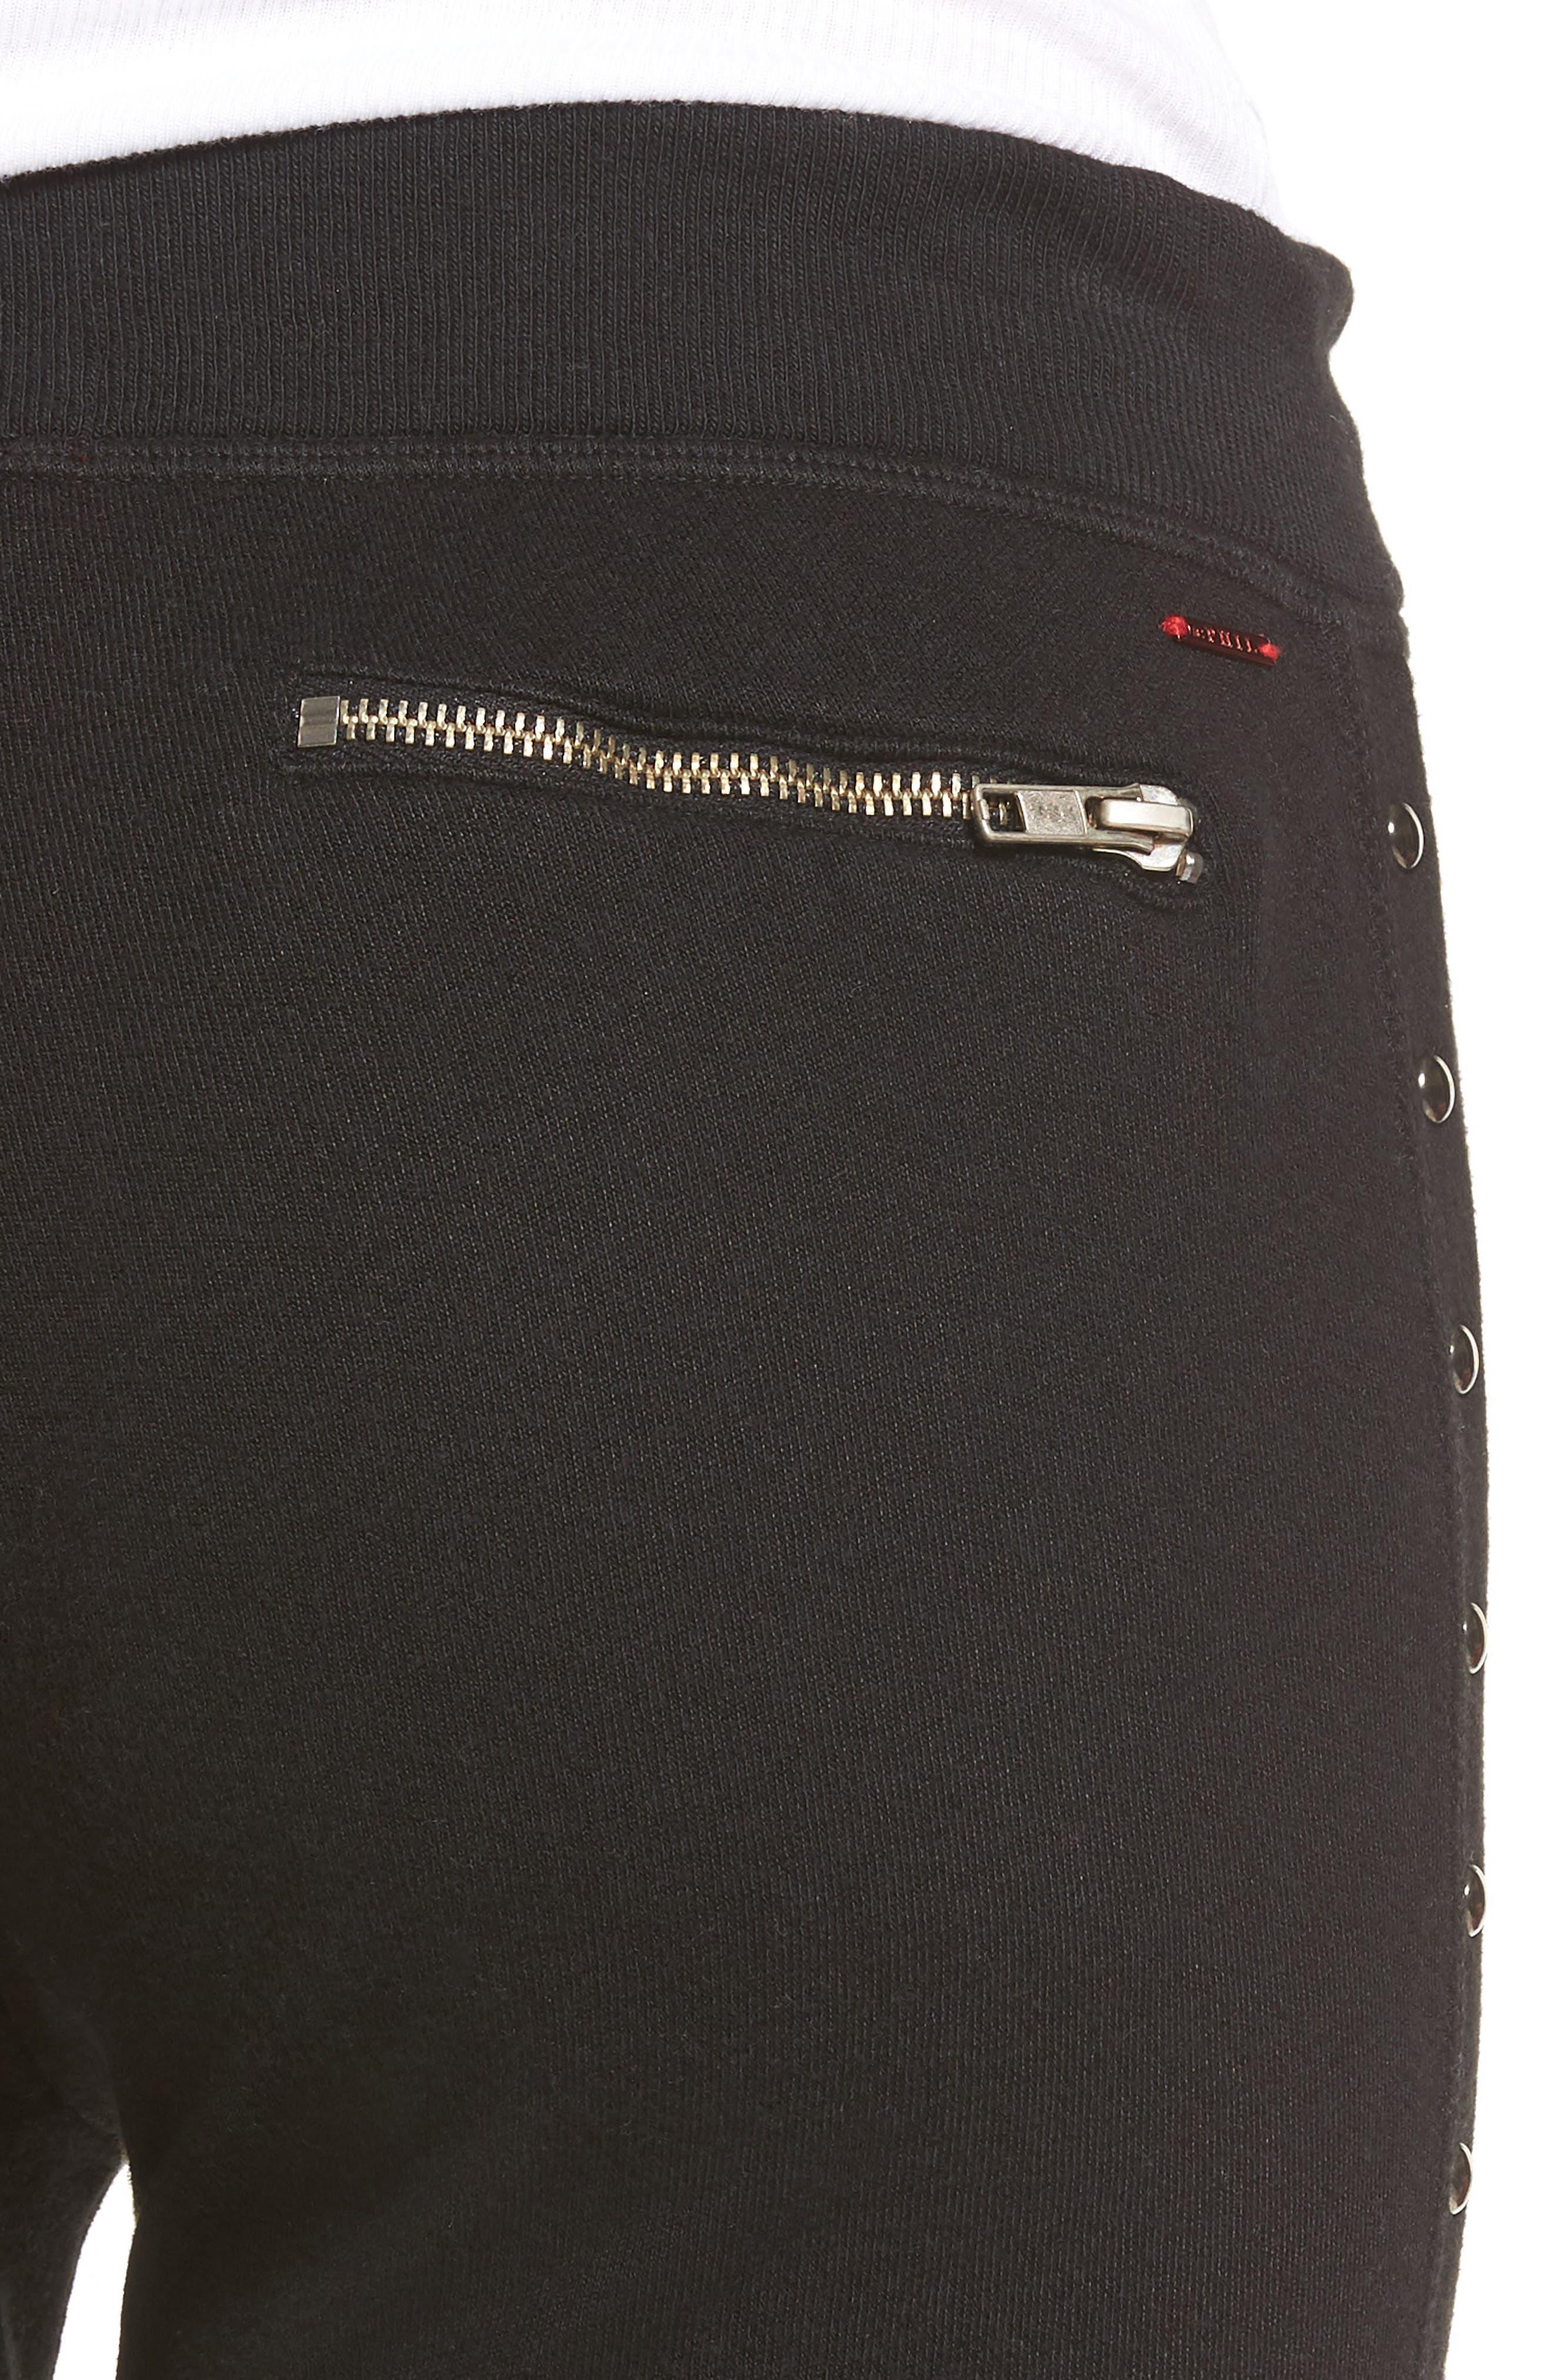 Joss Studded Sweatpants,                             Alternate thumbnail 4, color,                             001